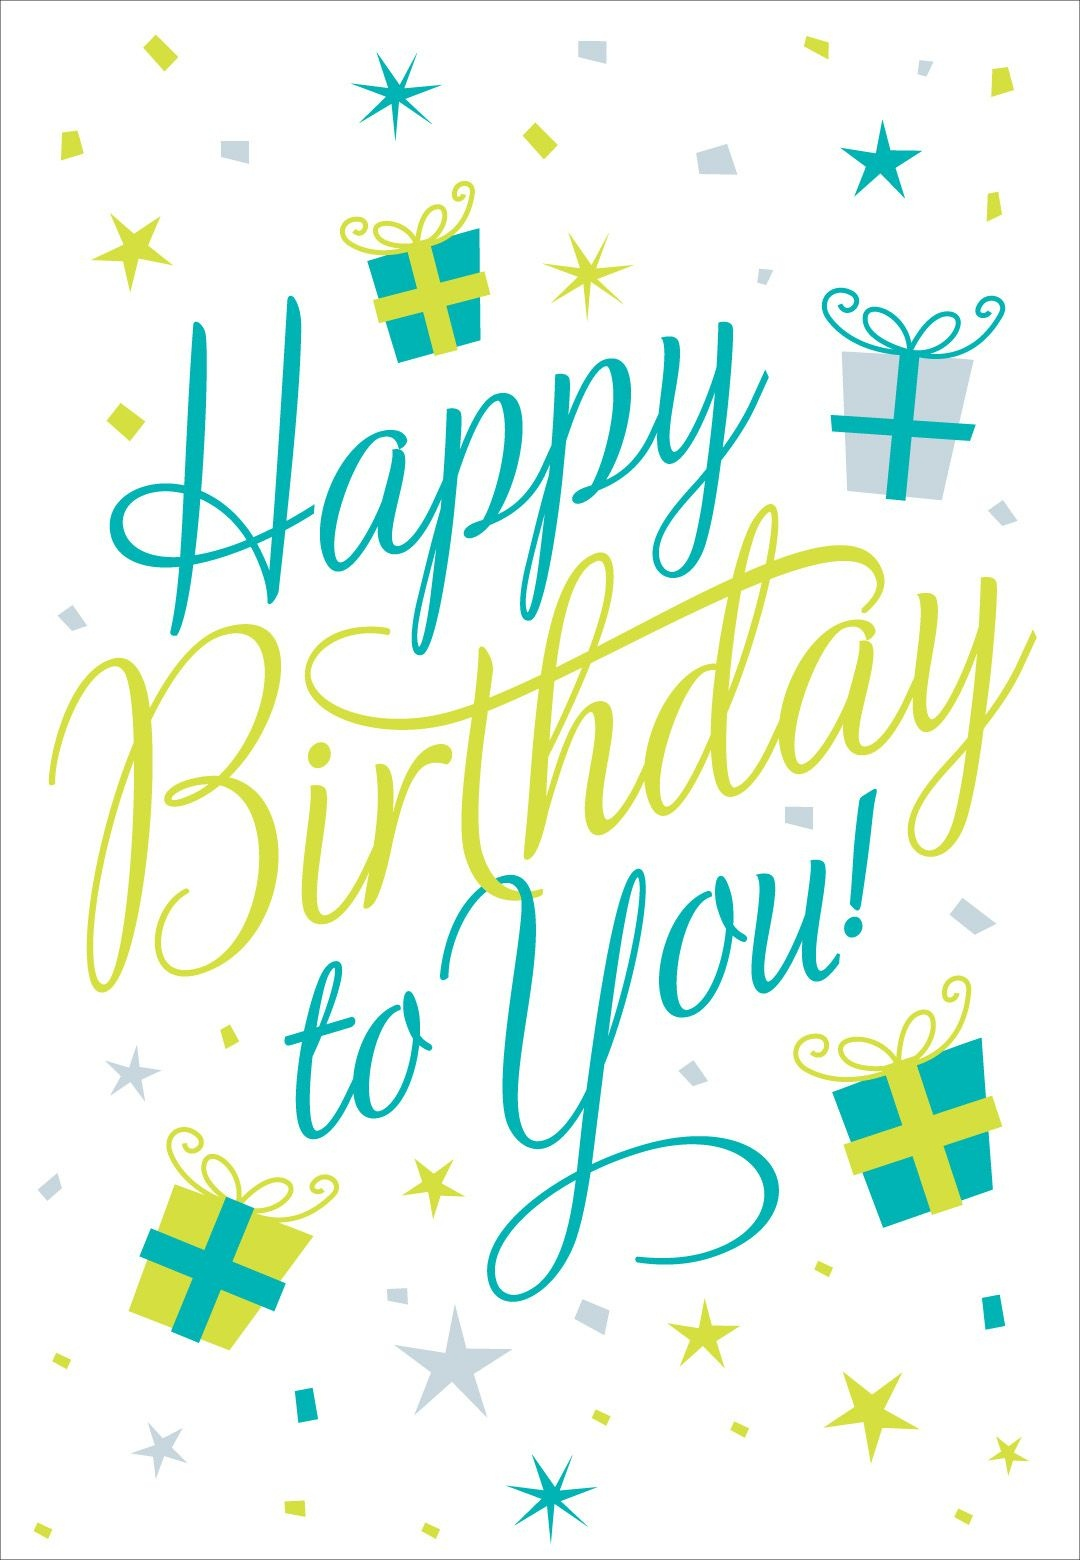 Free Printable Happy Birthday To You Greeting Card #birthday - Customized Birthday Cards Free Printable